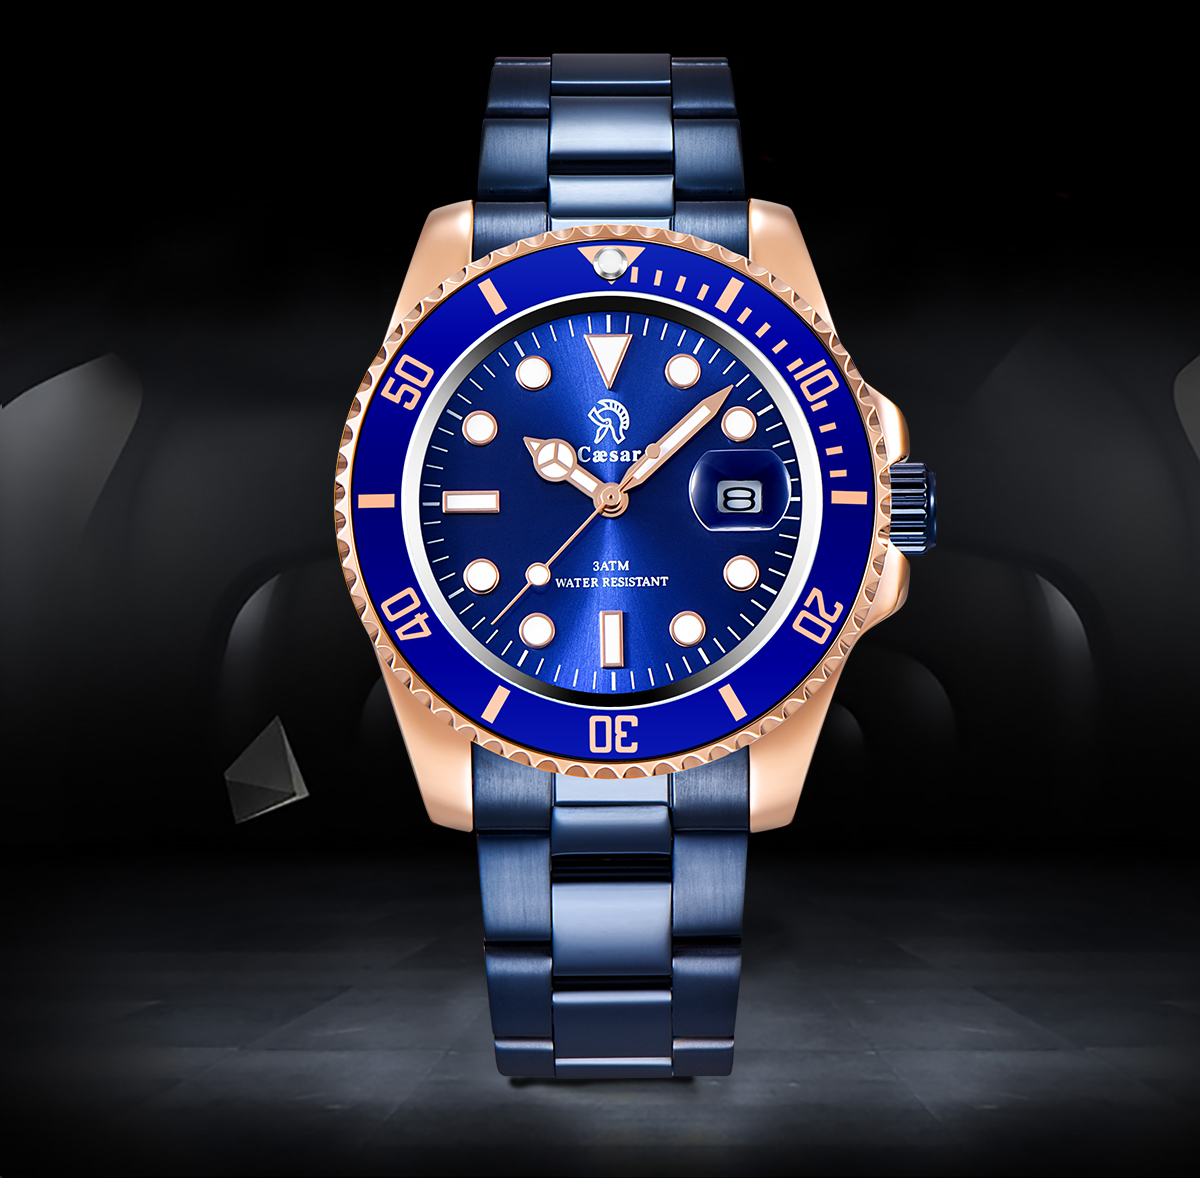 H5526e58d966e40e89466f75e98b3ee09m Rose Gold caesar  Top Brand Luxury Watches